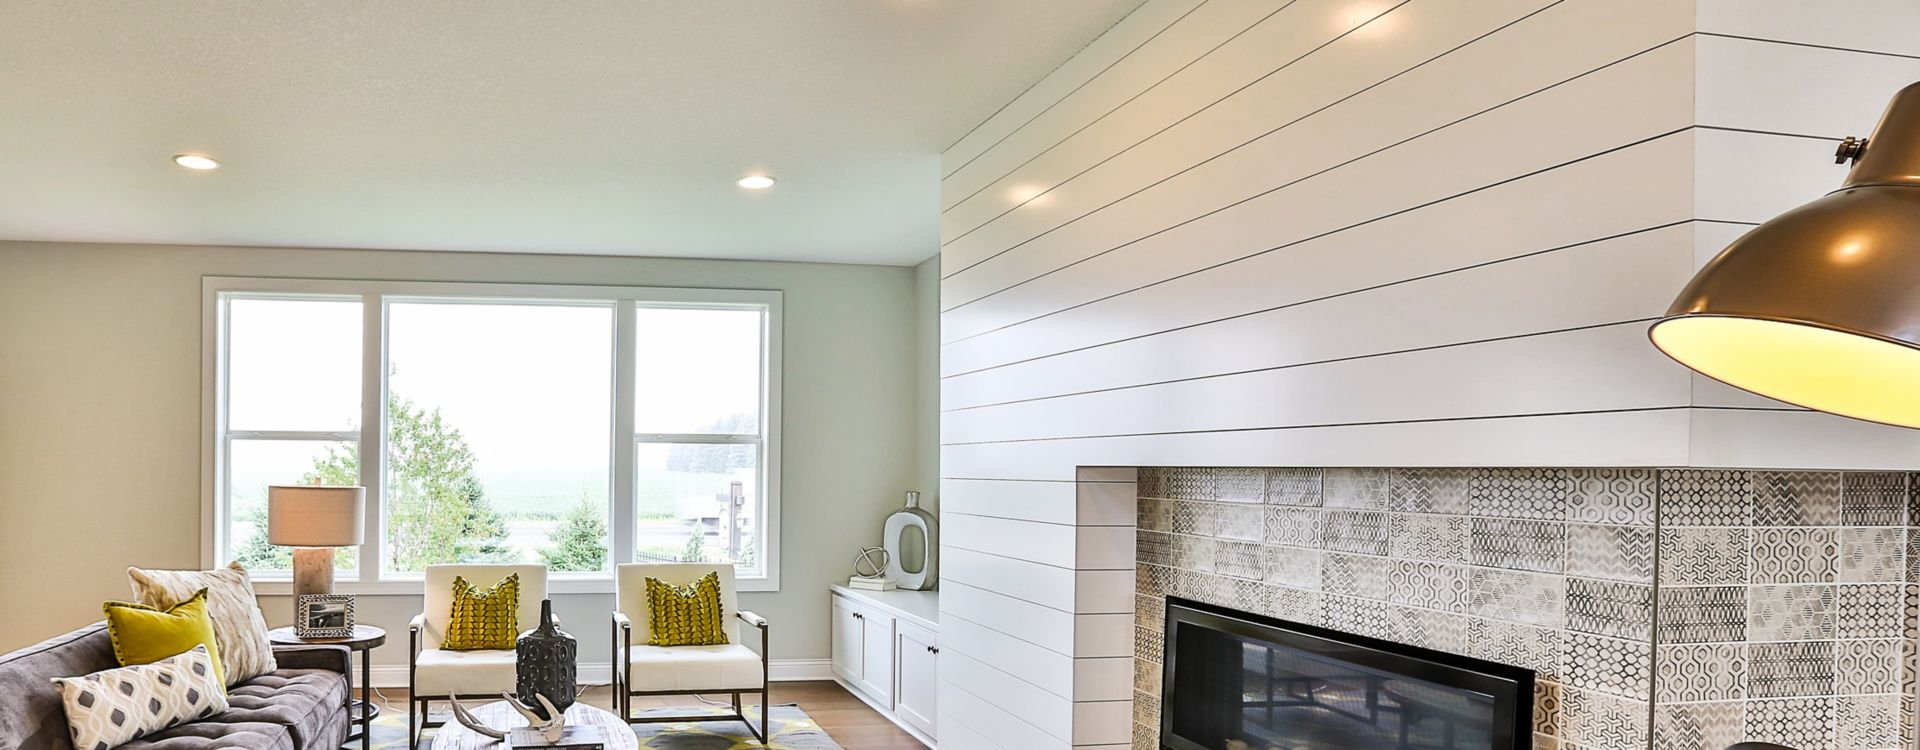 Fireplace Tile Ideas For 2019 The Tile Shop